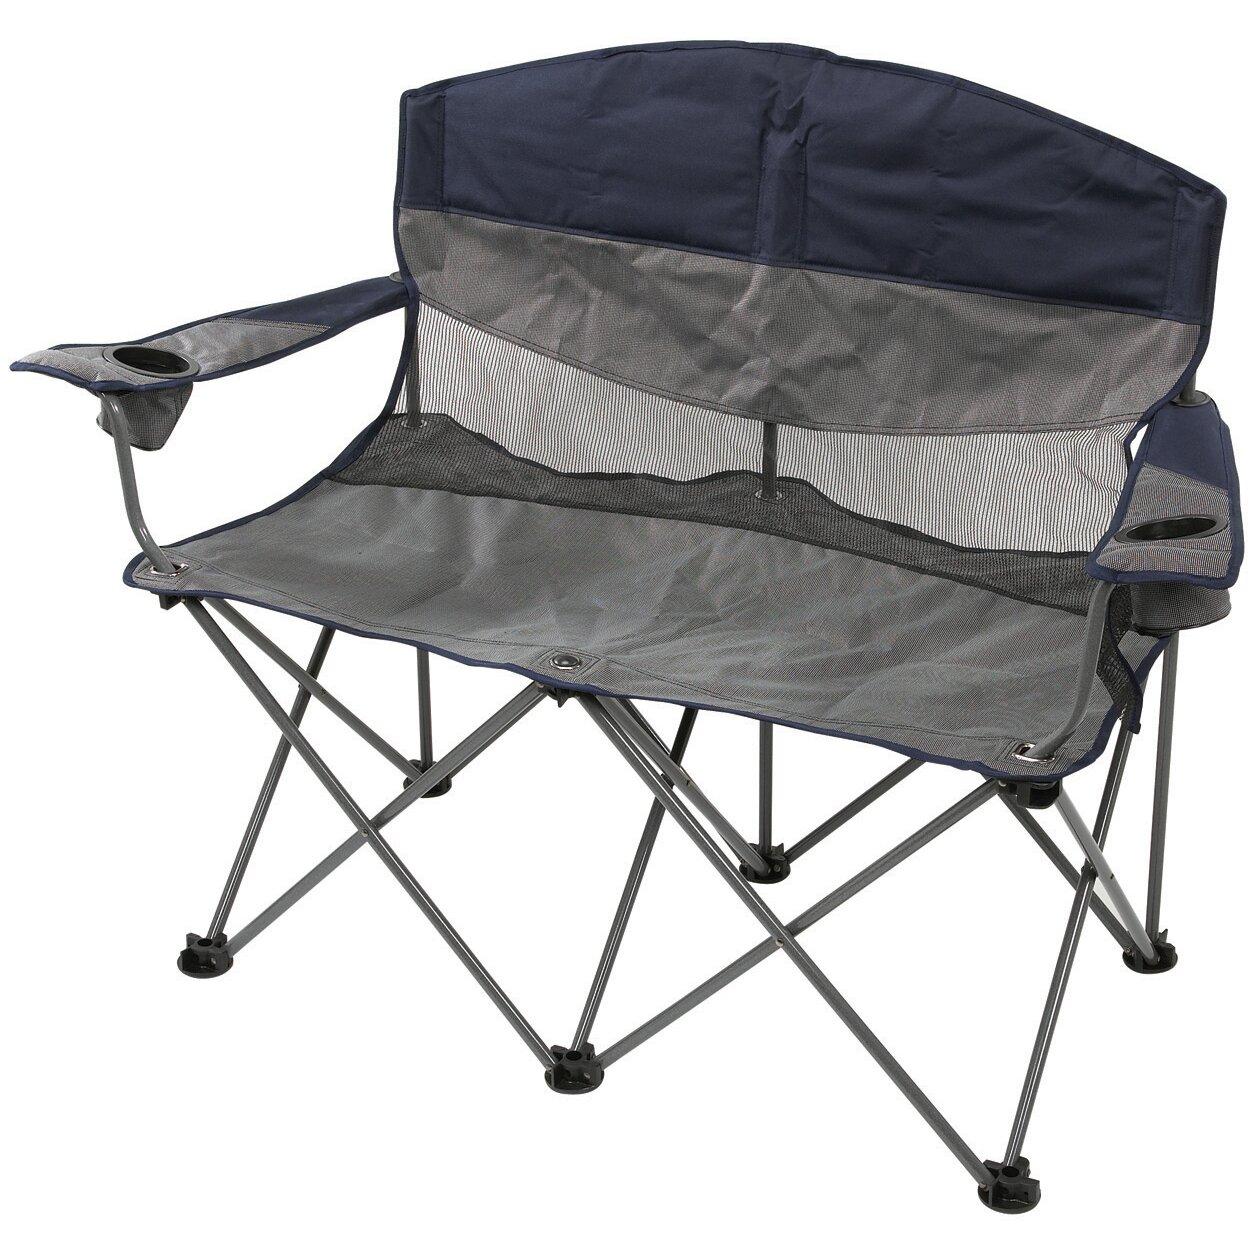 Stansport Apex Double Chair Amp Reviews Wayfair